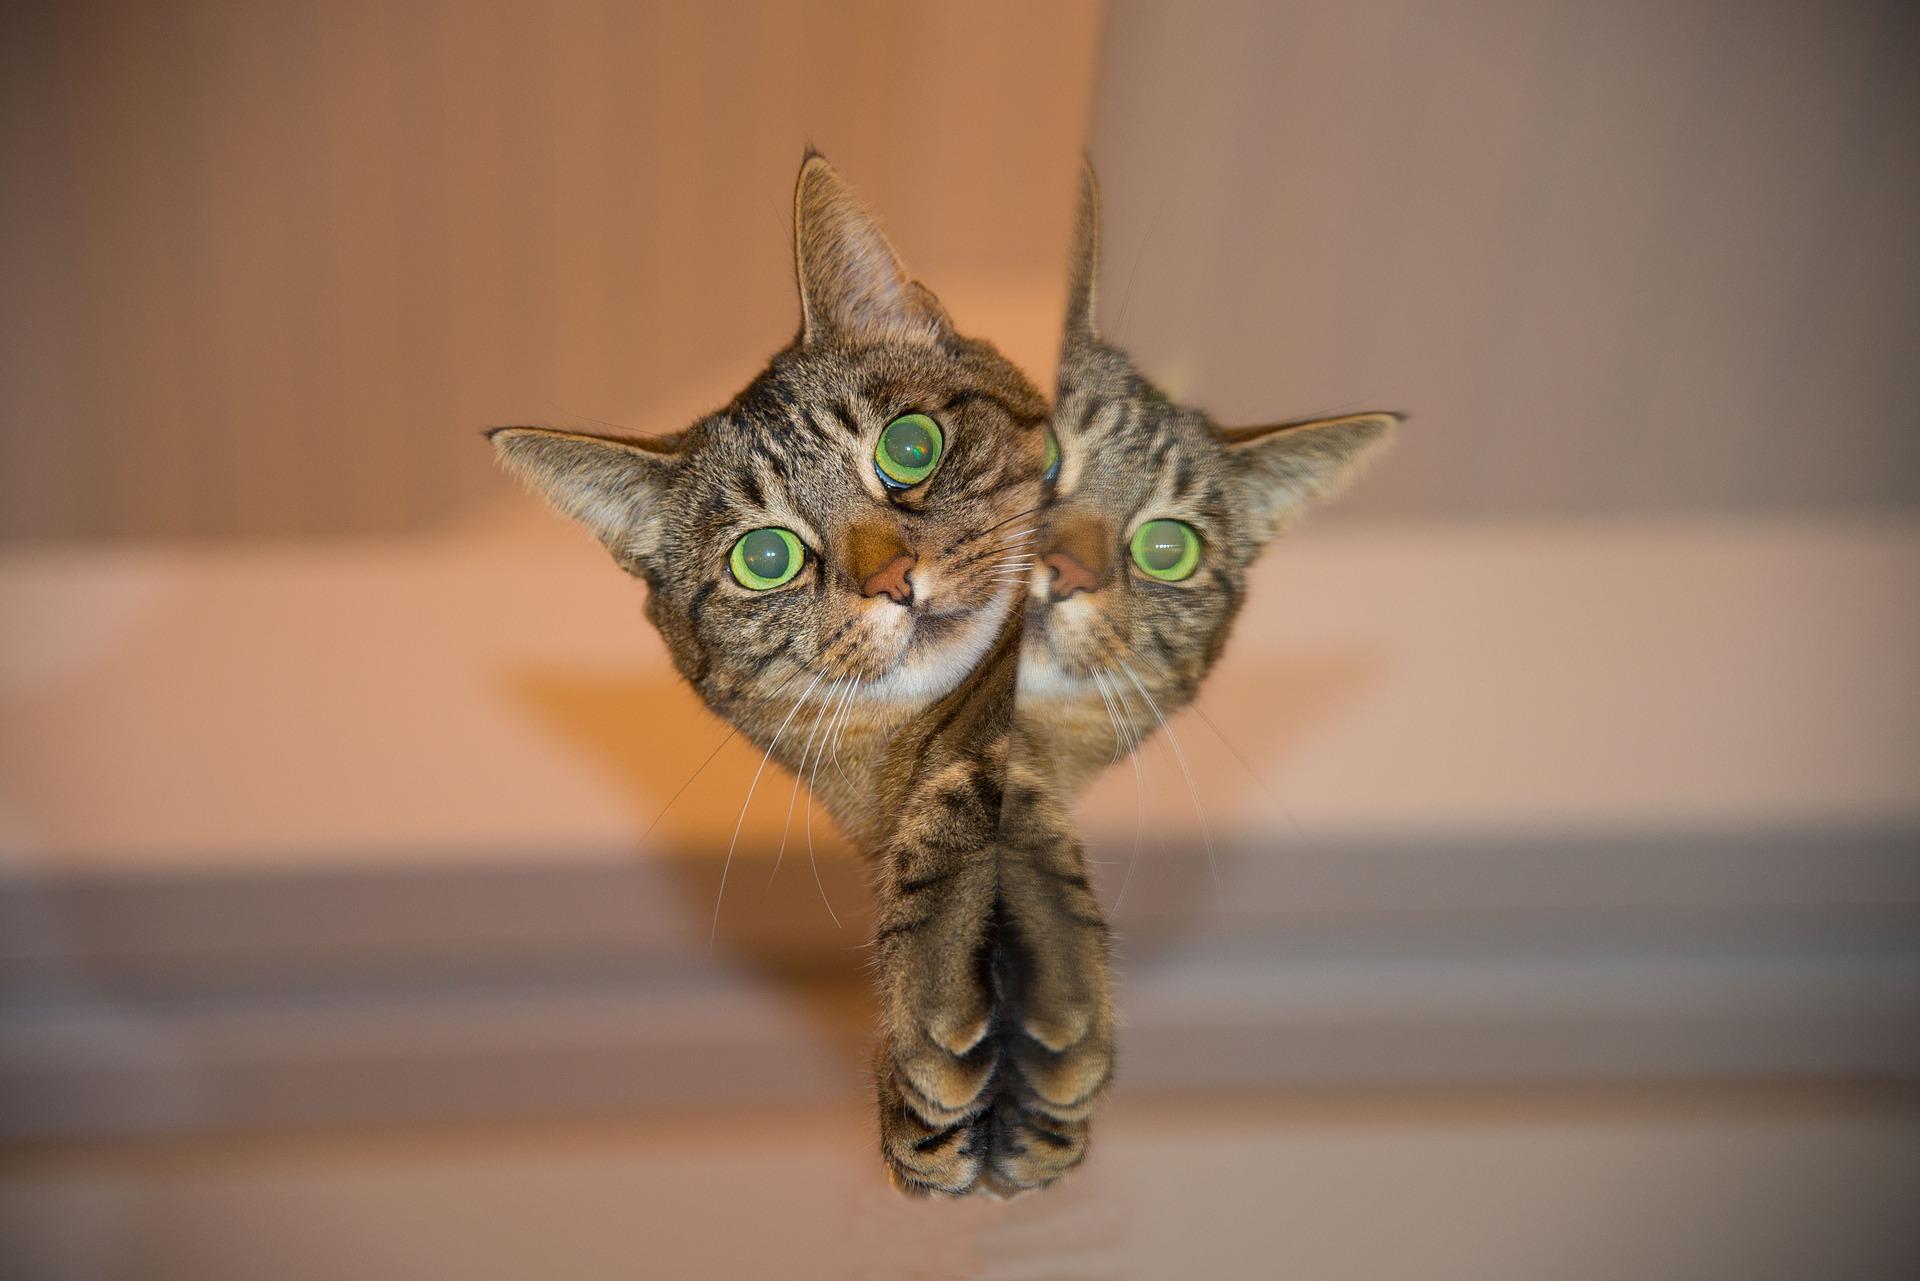 cat-697113_1920.jpg